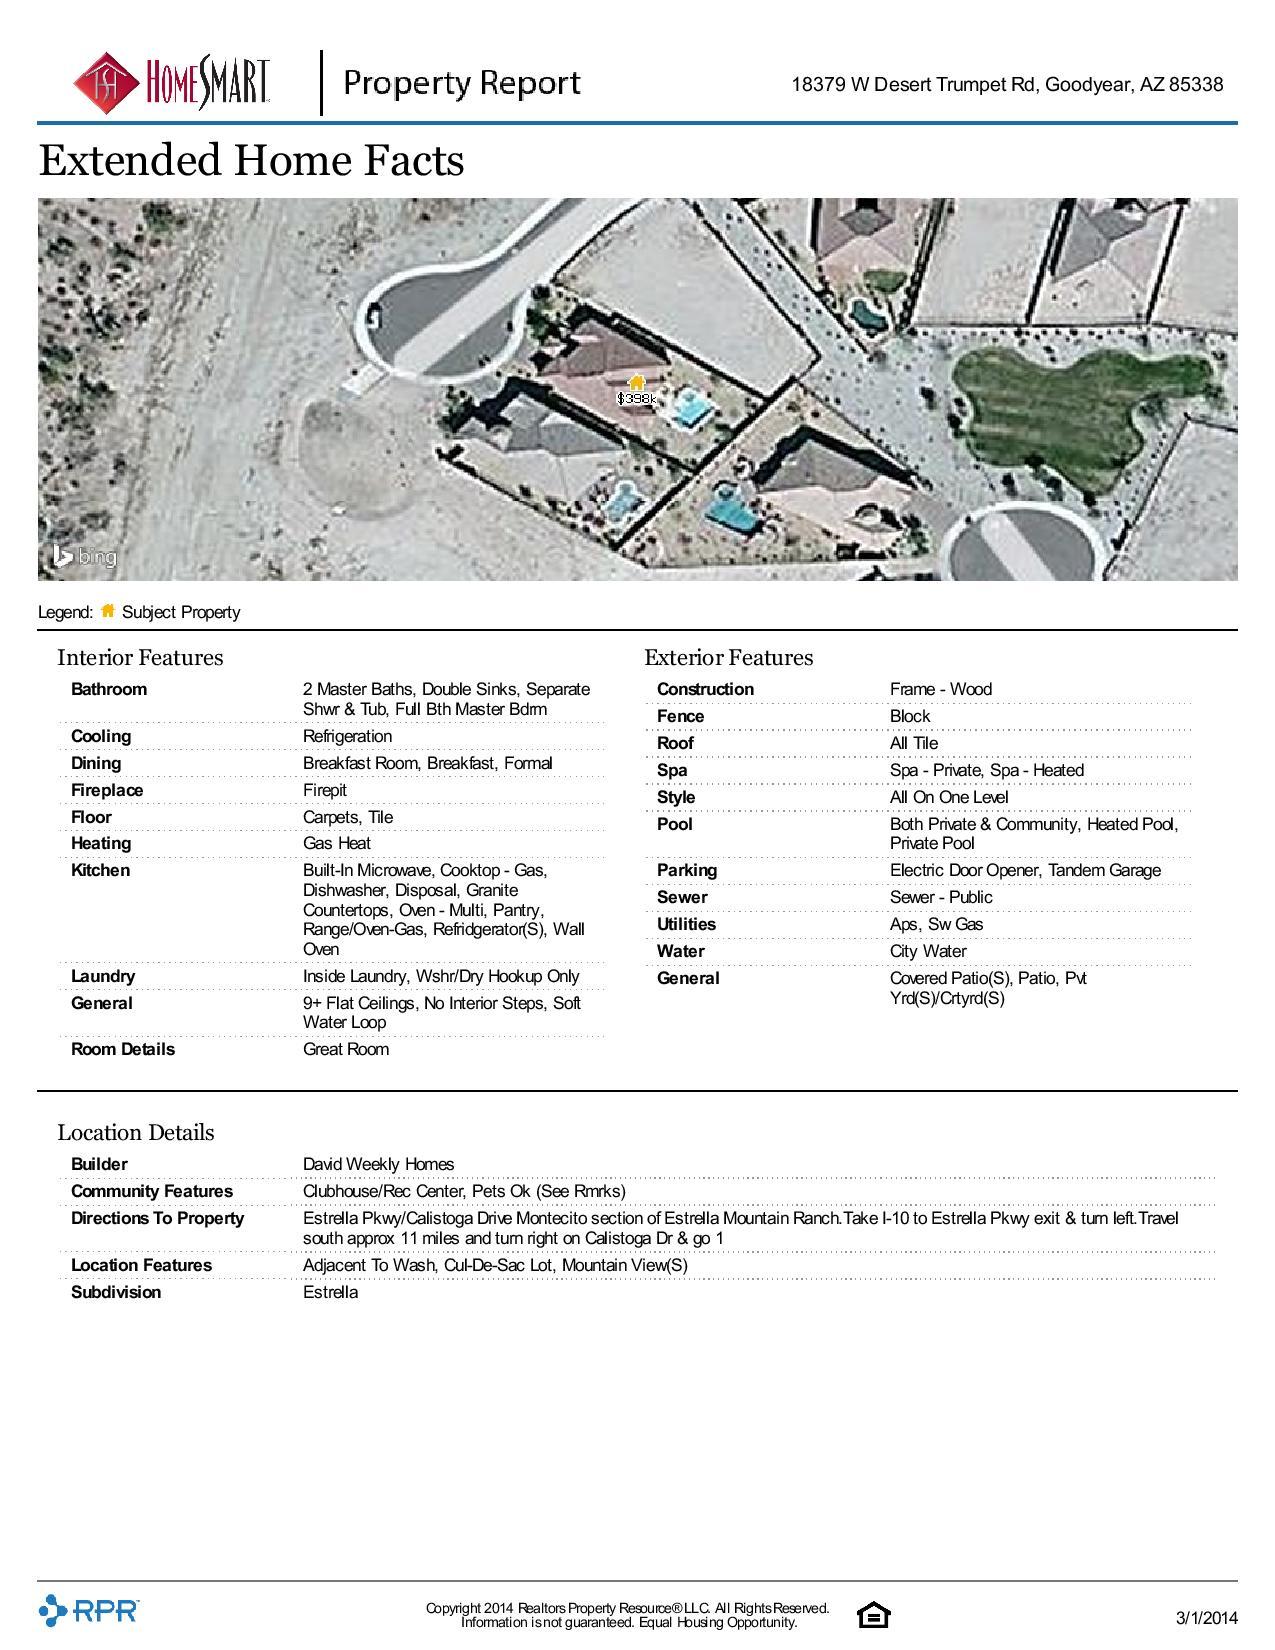 18379-W-Desert-Trumpet-Rd-Goodyear-AZ-85338-page-004